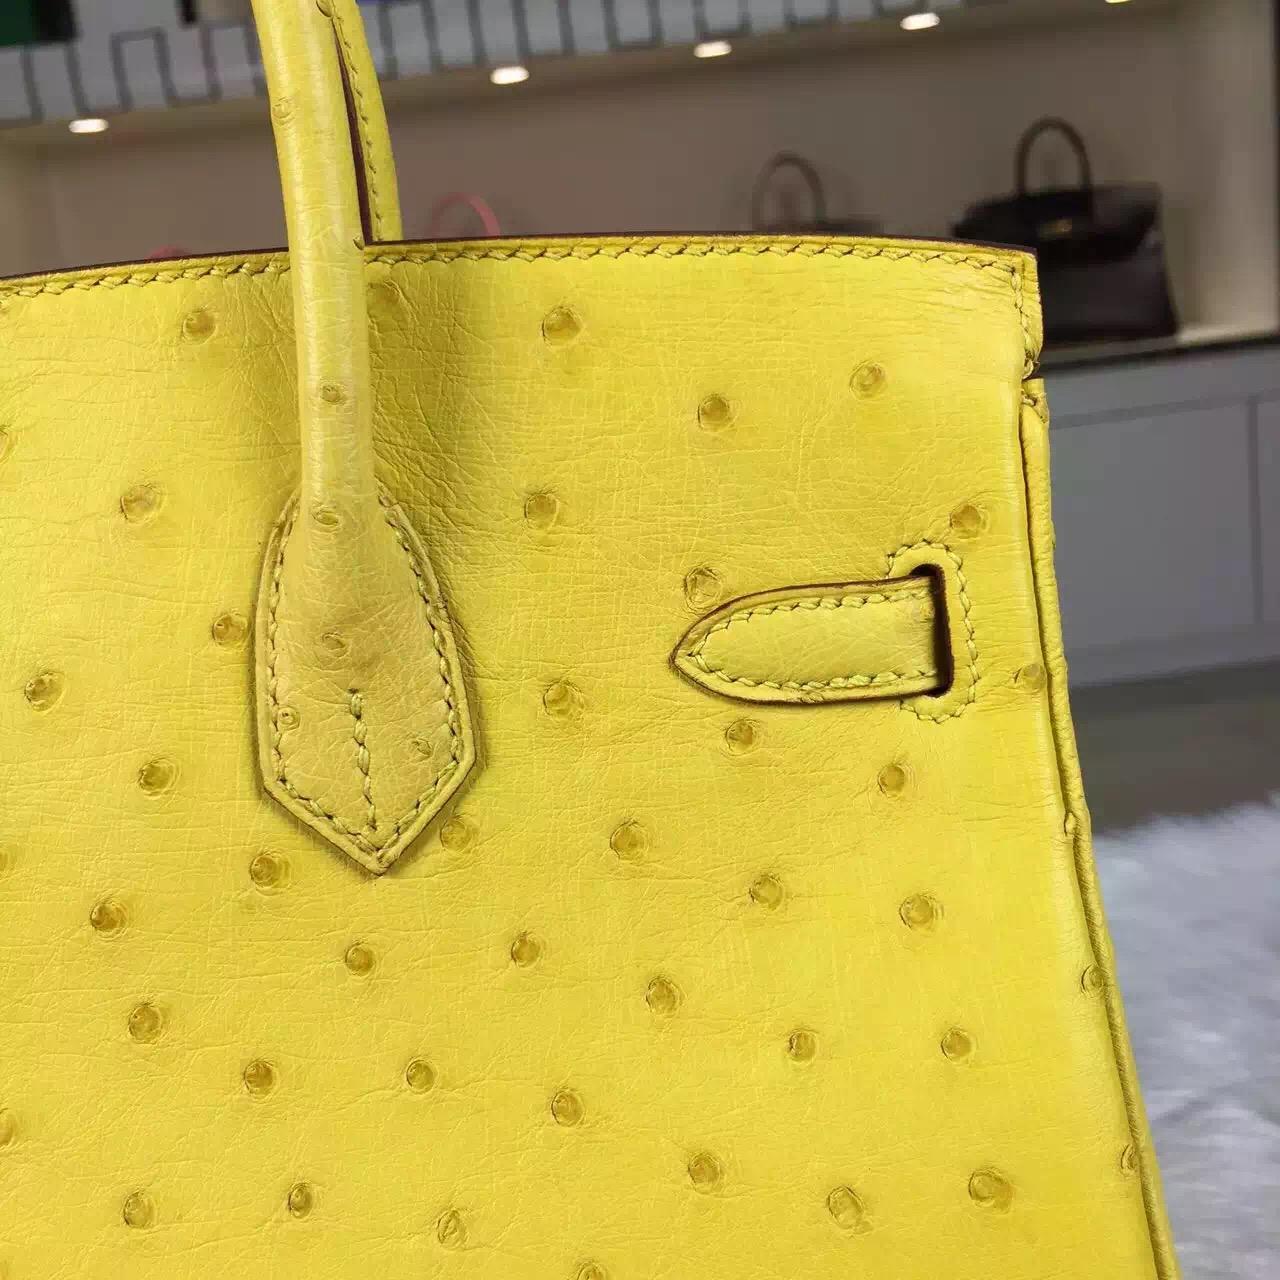 Hermes Customised HCP Original Ostrich Leather Birkin Bag 25cm in Lemon Yellow